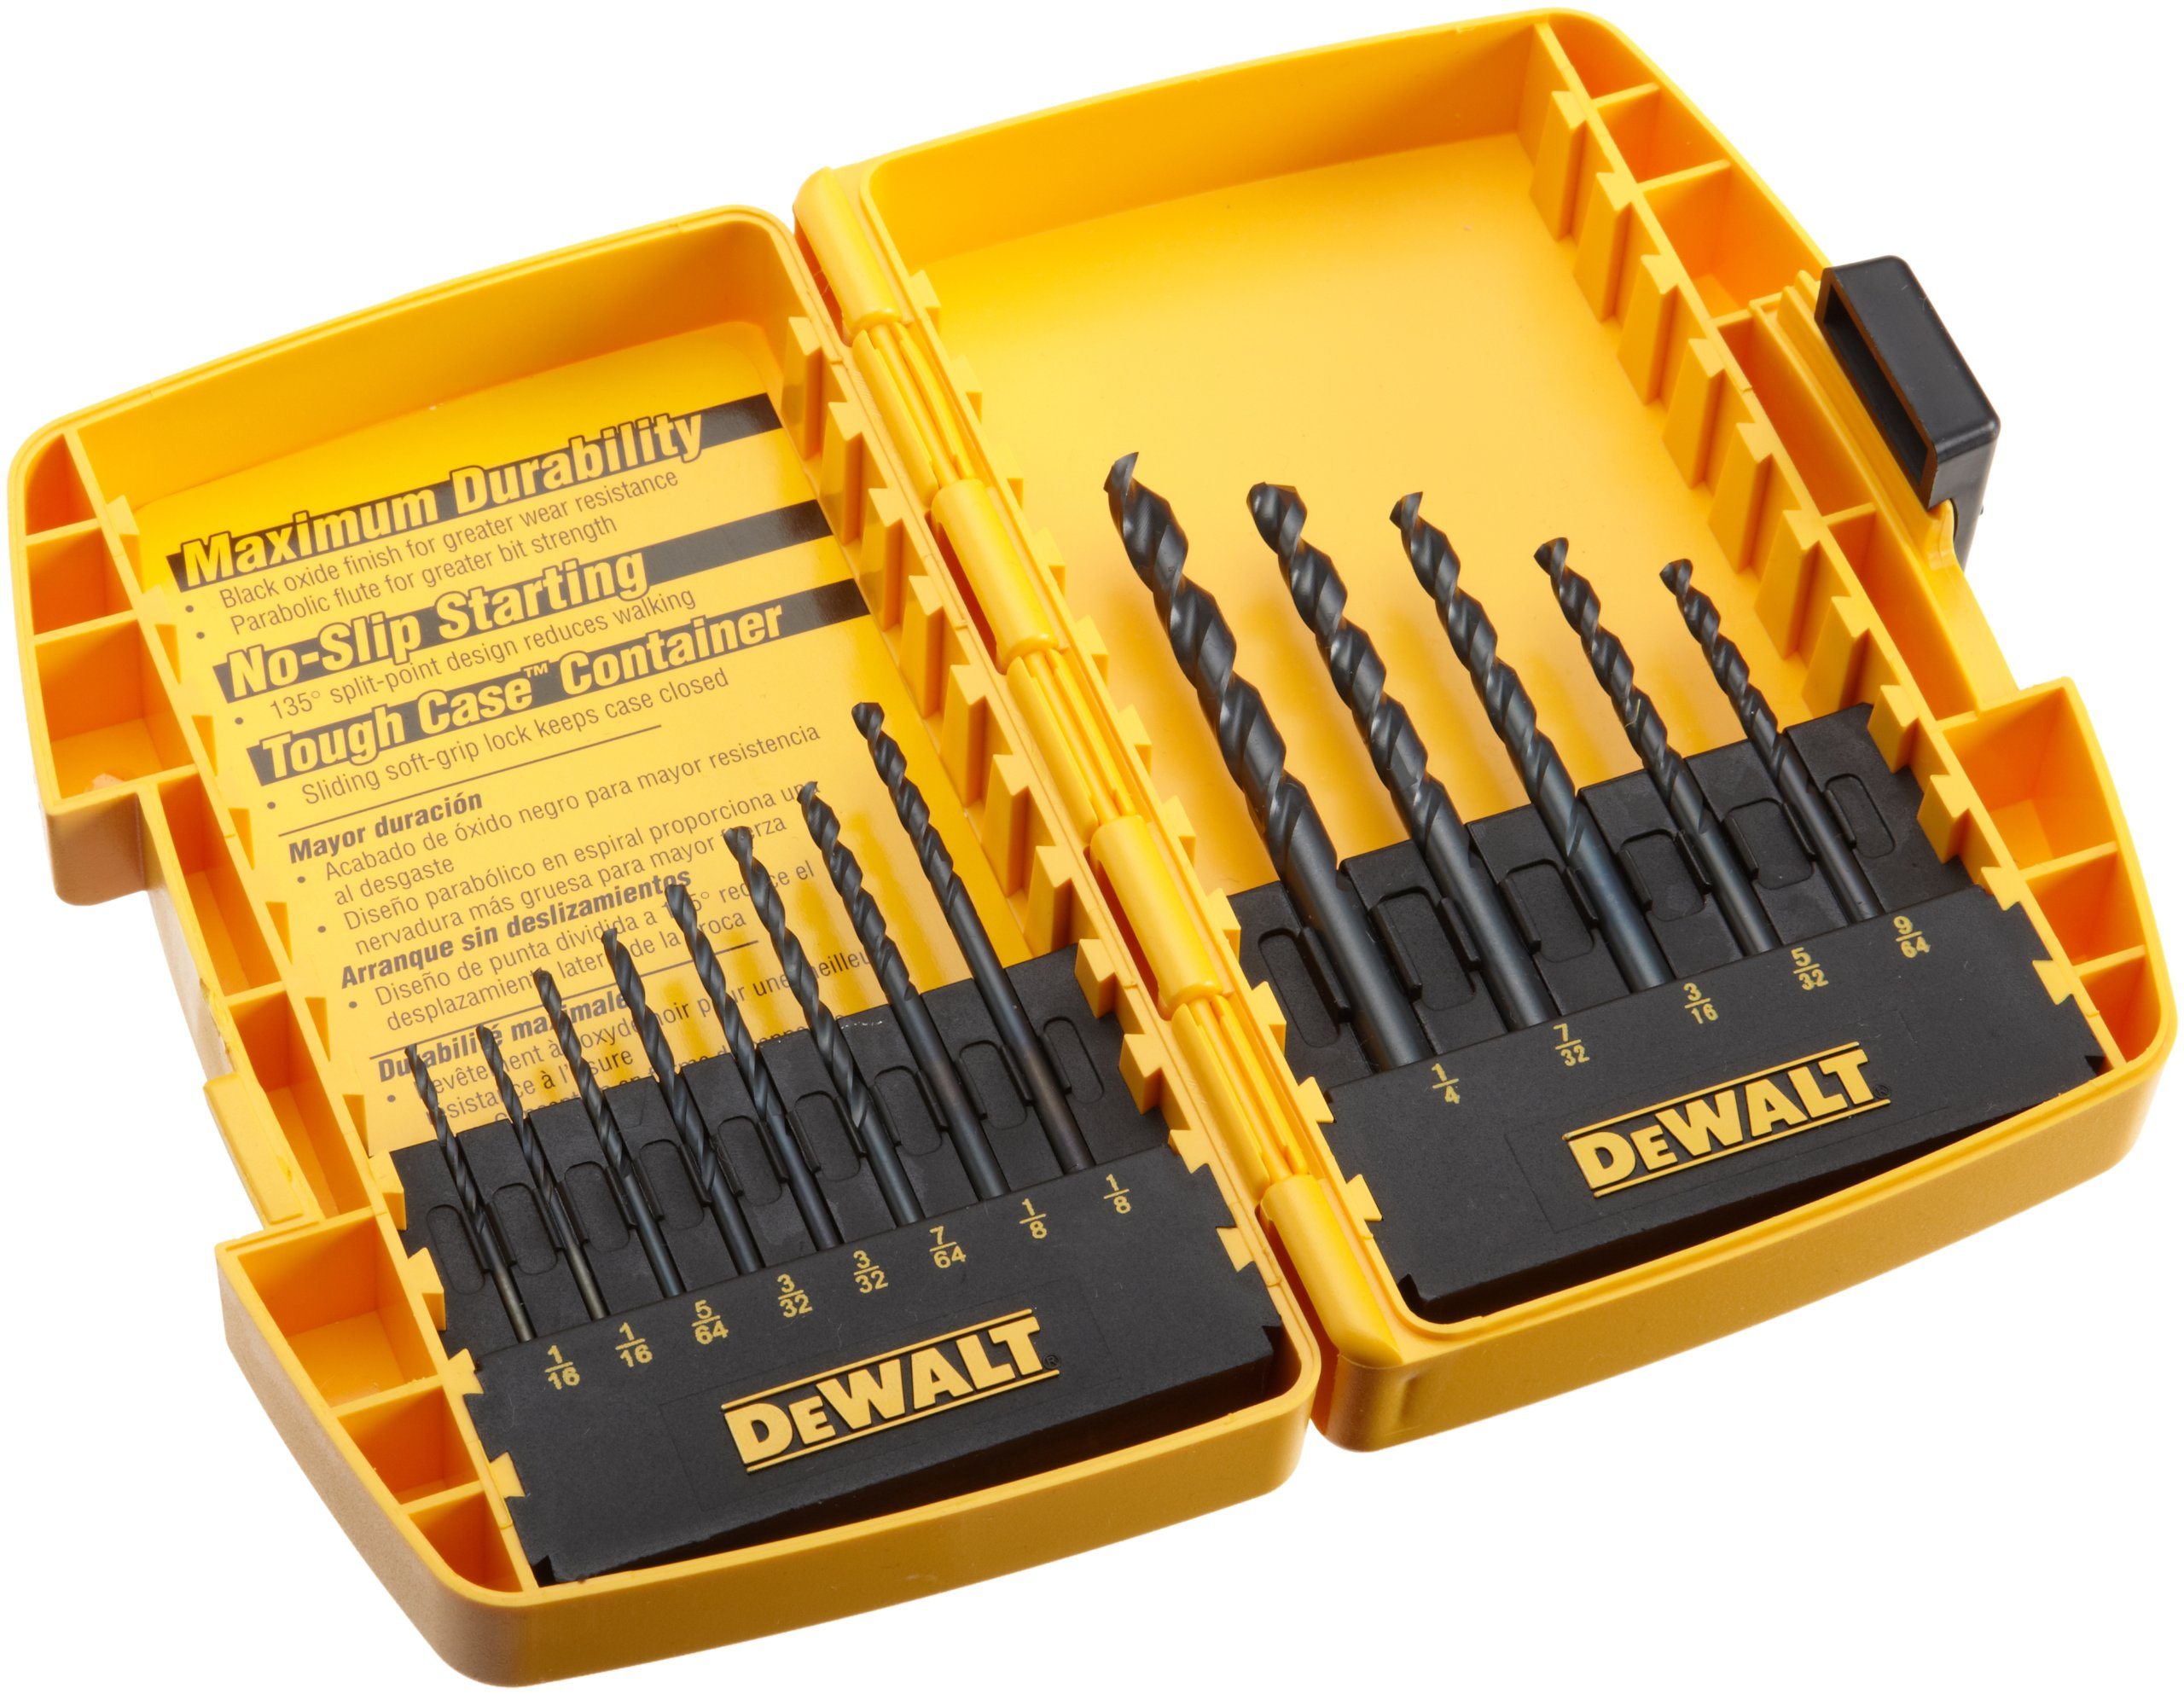 DEWALT DW1163 Black Oxide Split Point Twist Drill Bit Assortment, 13-Piece product image